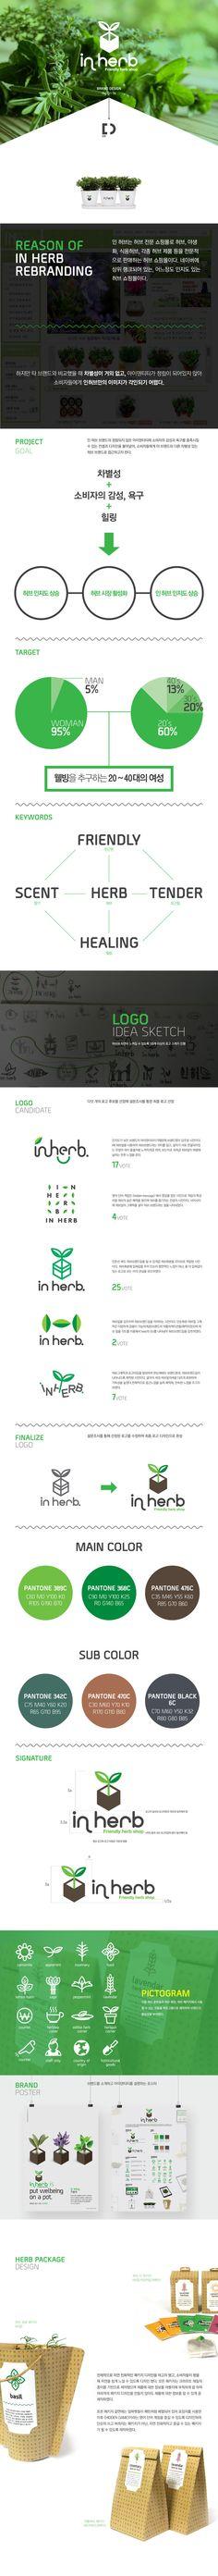 IN HERB REBRANDING PROJECT - 디지털 아트 · 영상/모션그래픽 · 브랜딩/편집, 디지털 아트, 영상/모션그래픽, 브랜딩/편집, 브랜딩/편집 Ppt Design, Signage Design, Layout Design, Logo Design, Graphic Design, Business Powerpoint Templates, Portfolio Layout, Identity Design, Design Process